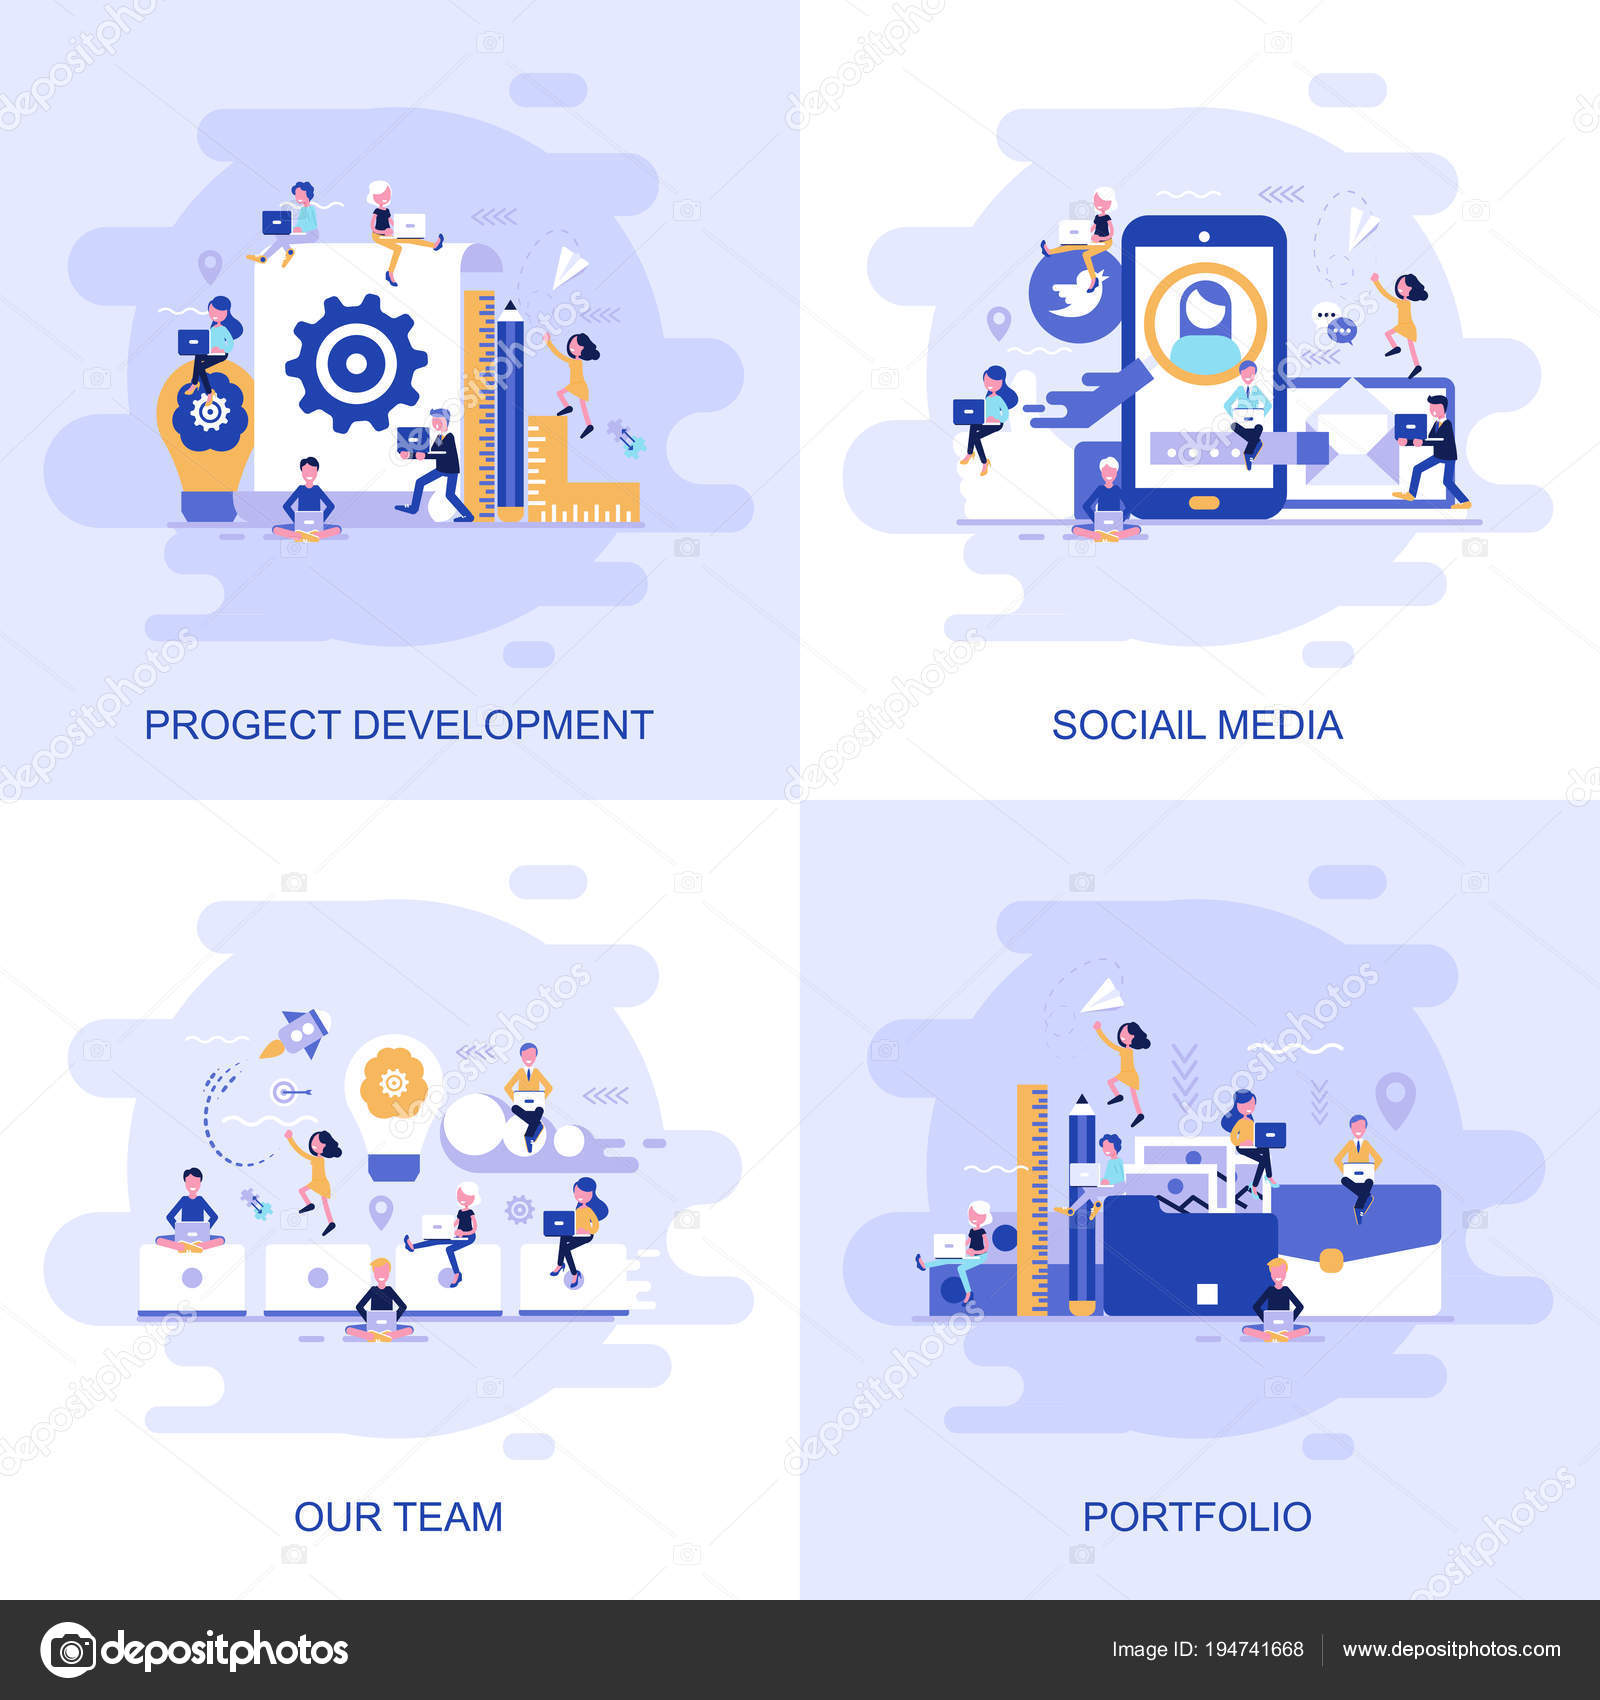 Modern flat concept web banner of Social Media, Our Team, Portfolio